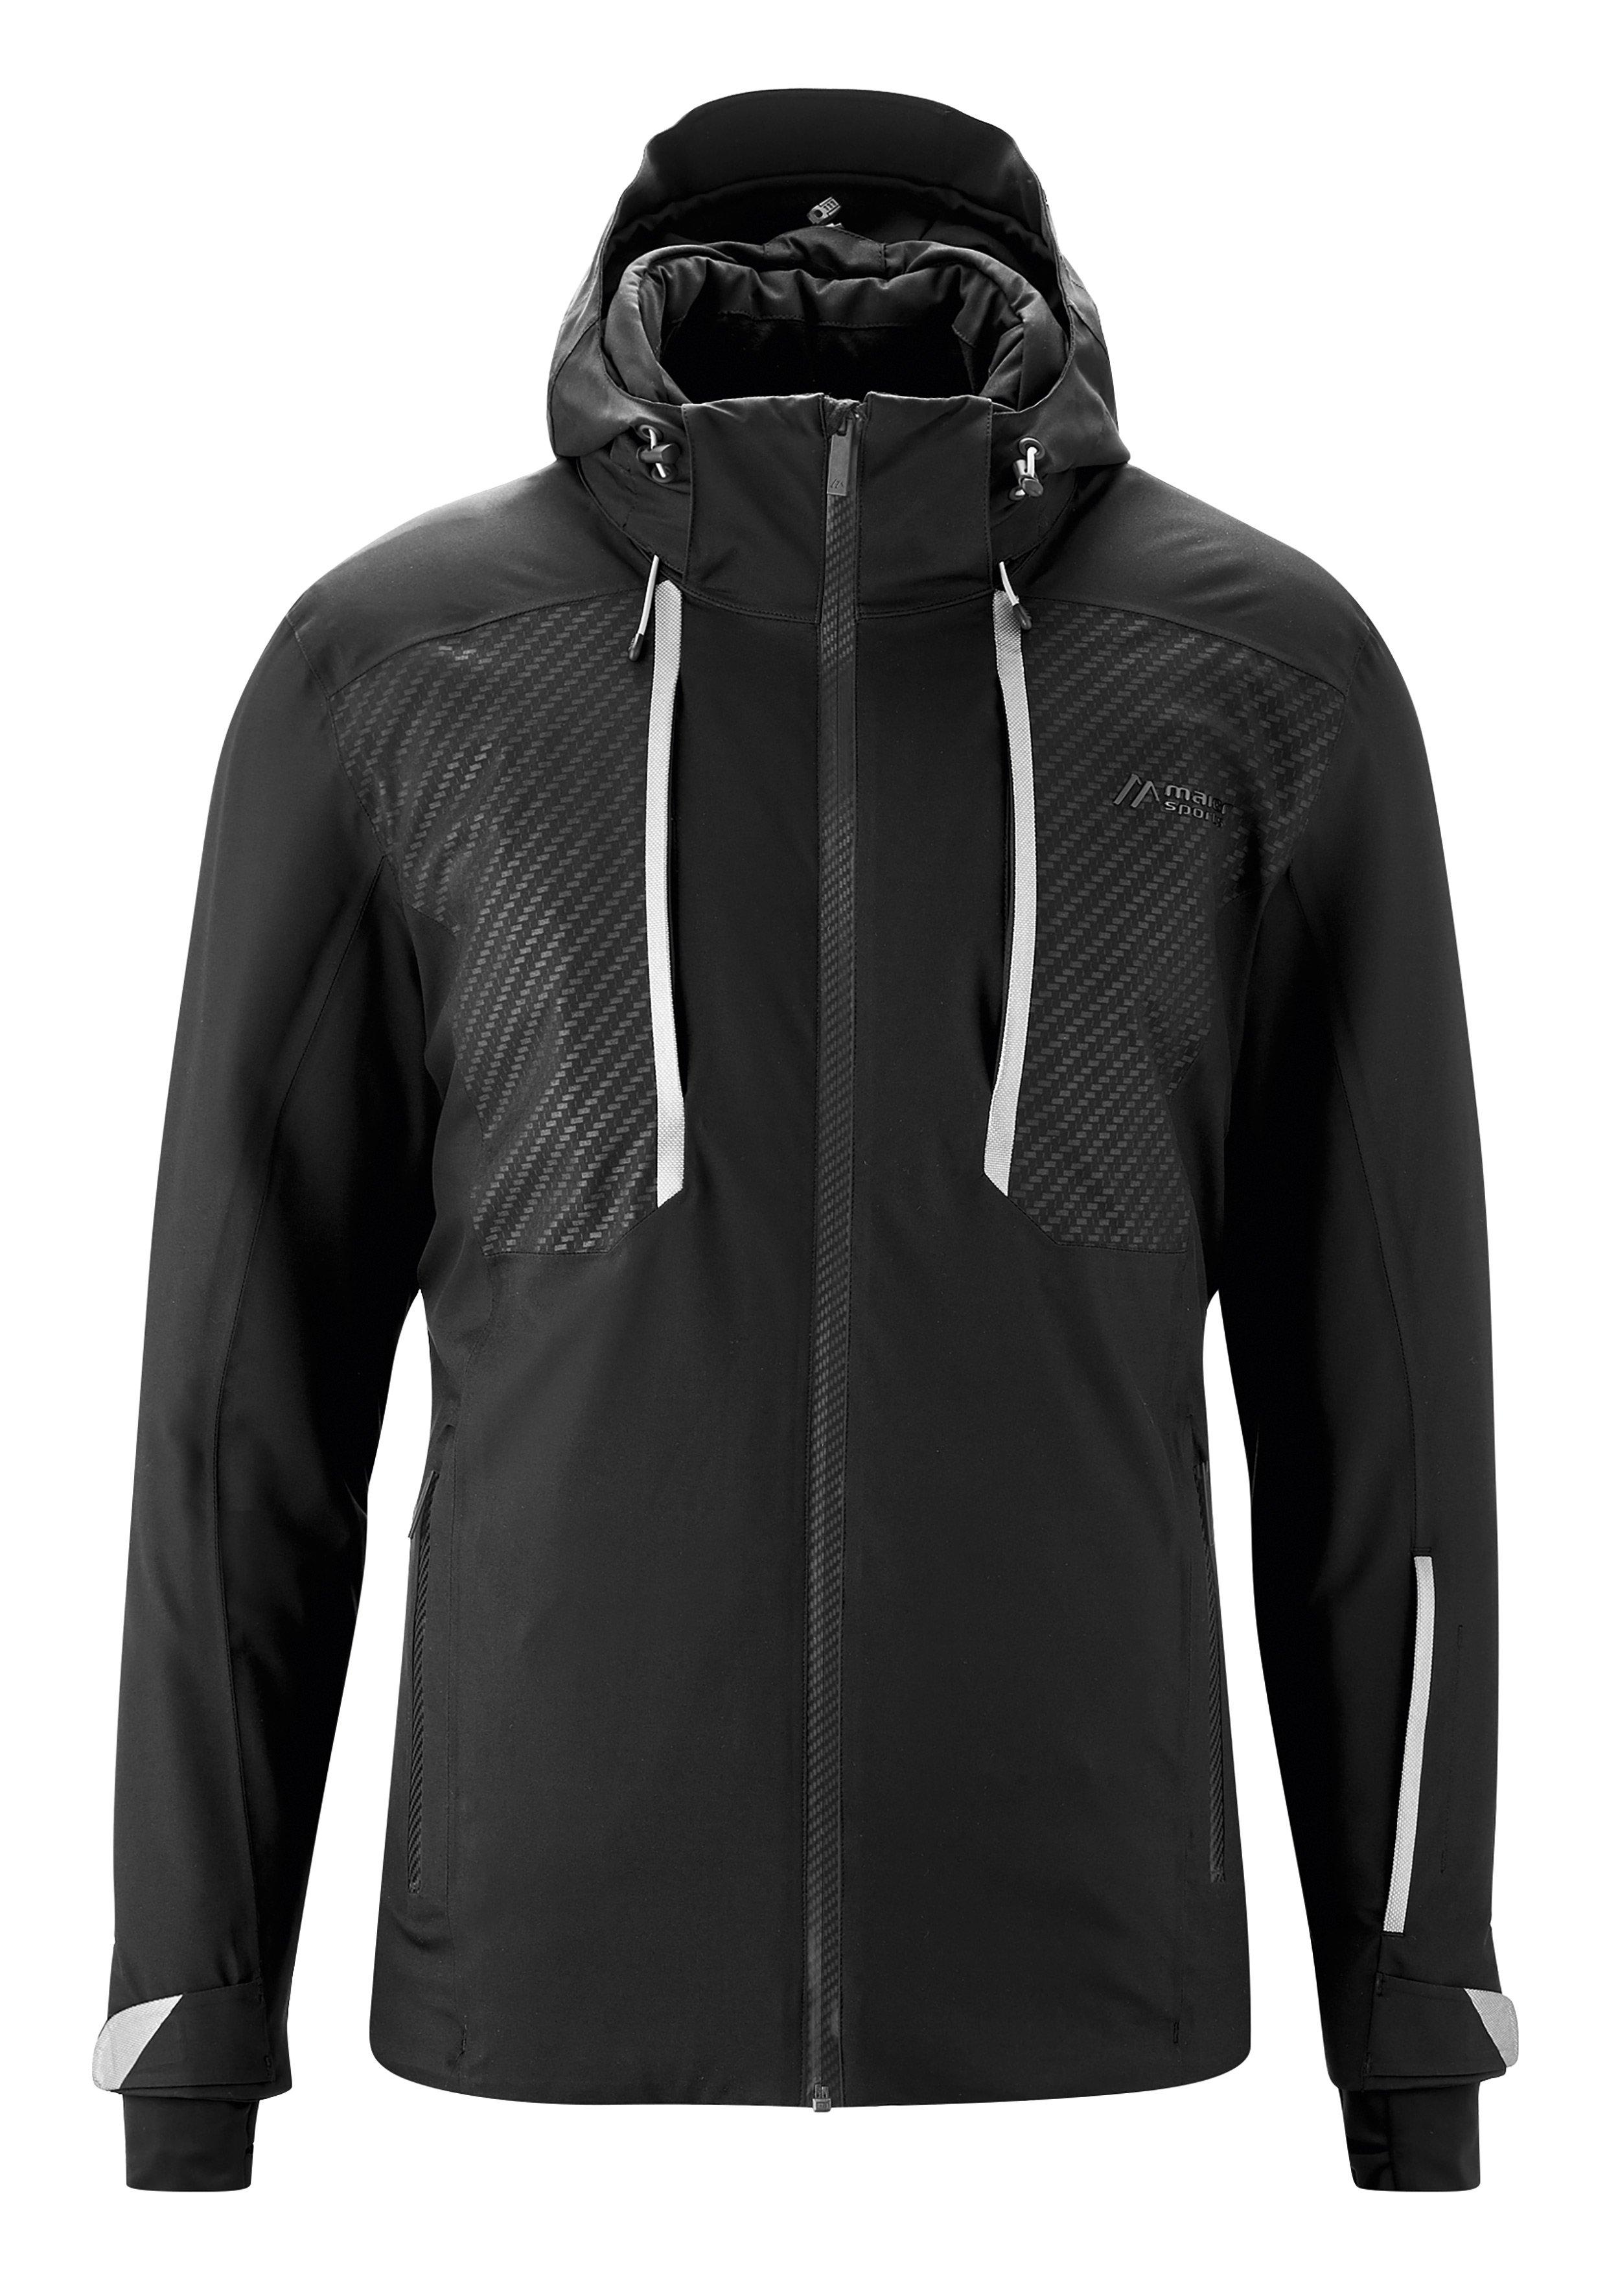 Maier Sports Skijacke Carbo Jacket M schwarz Herren Übergangsjacken Jacken